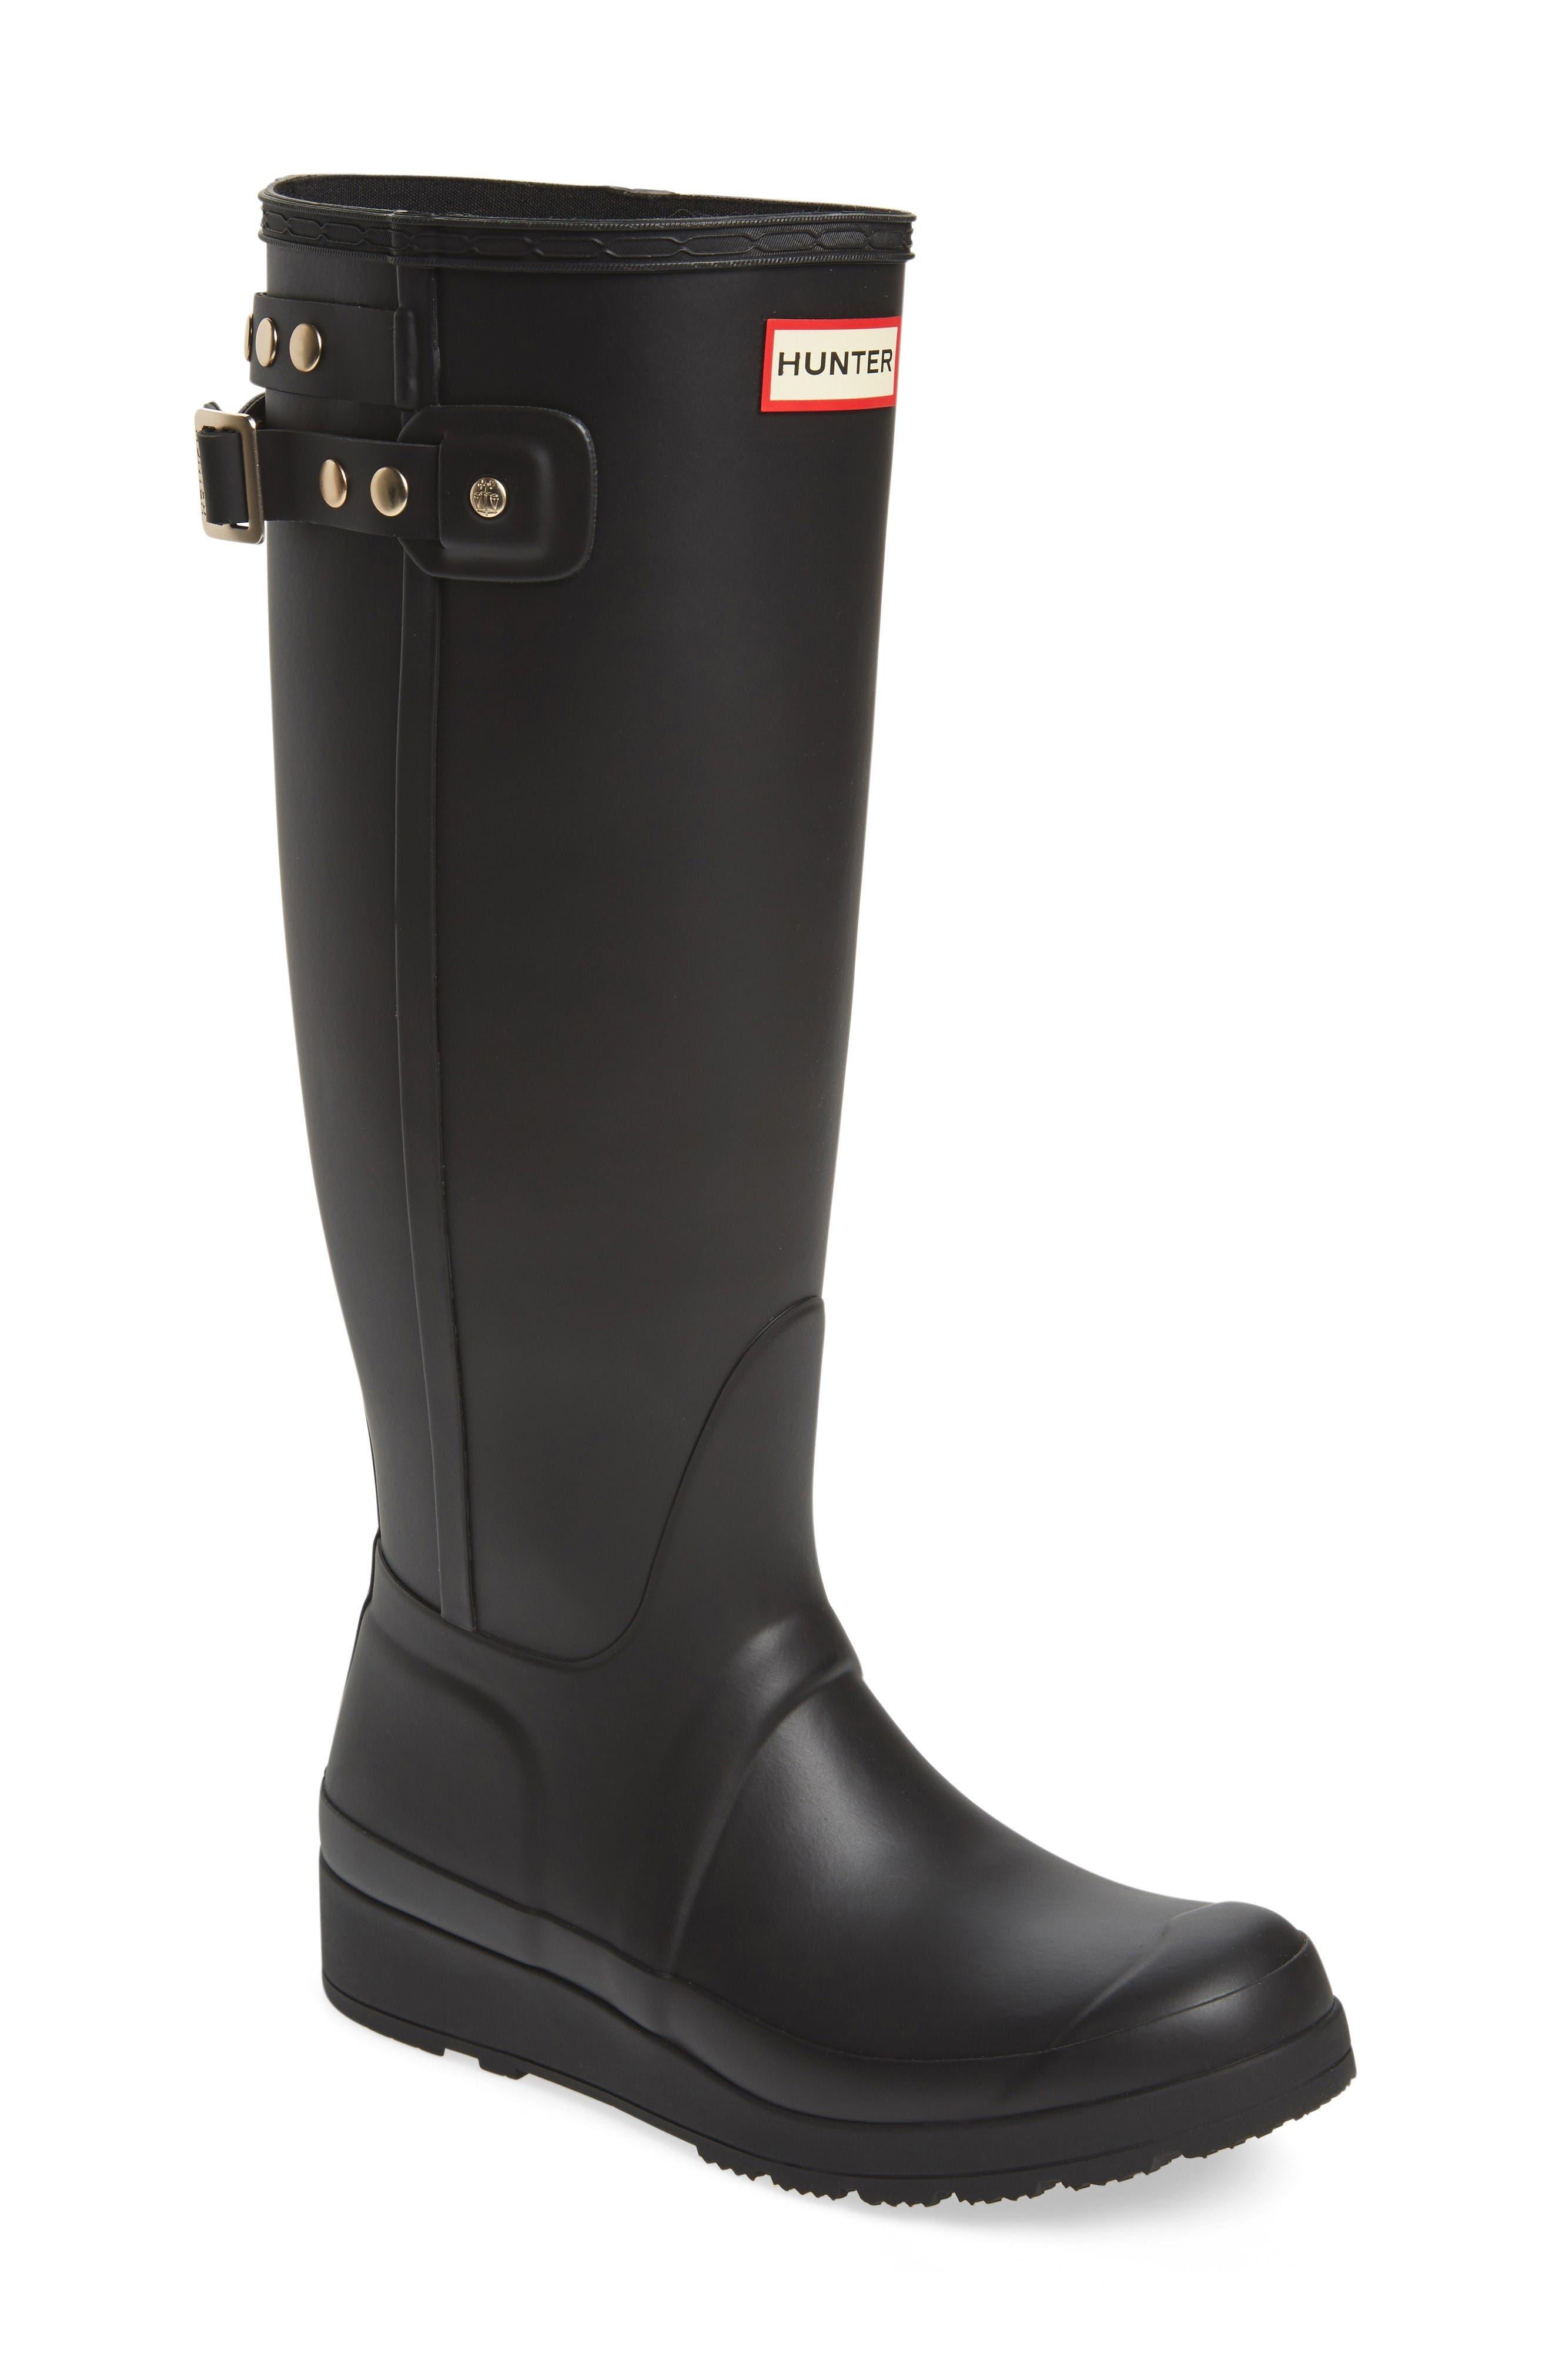 Main Image - Hunter Original Tall Studded Wedge Rain Boot (Women)